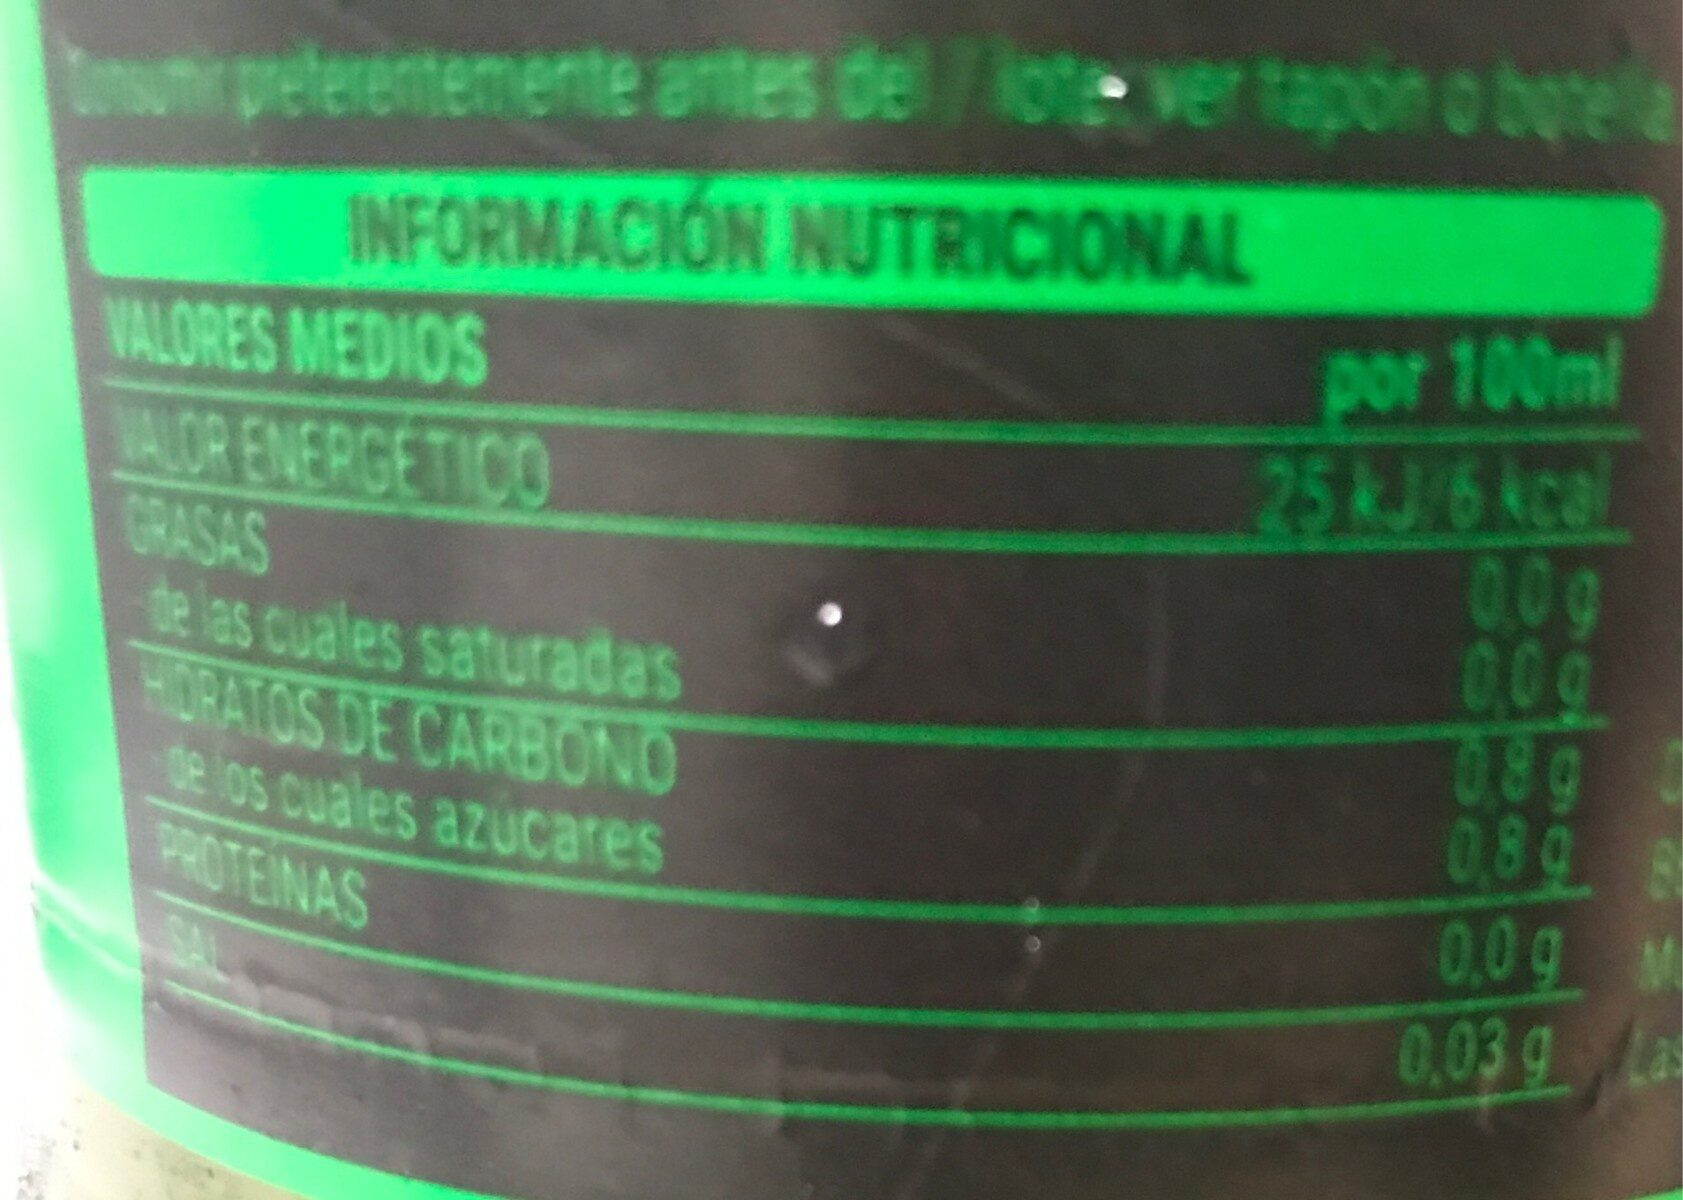 Fresh gas - Informació nutricional